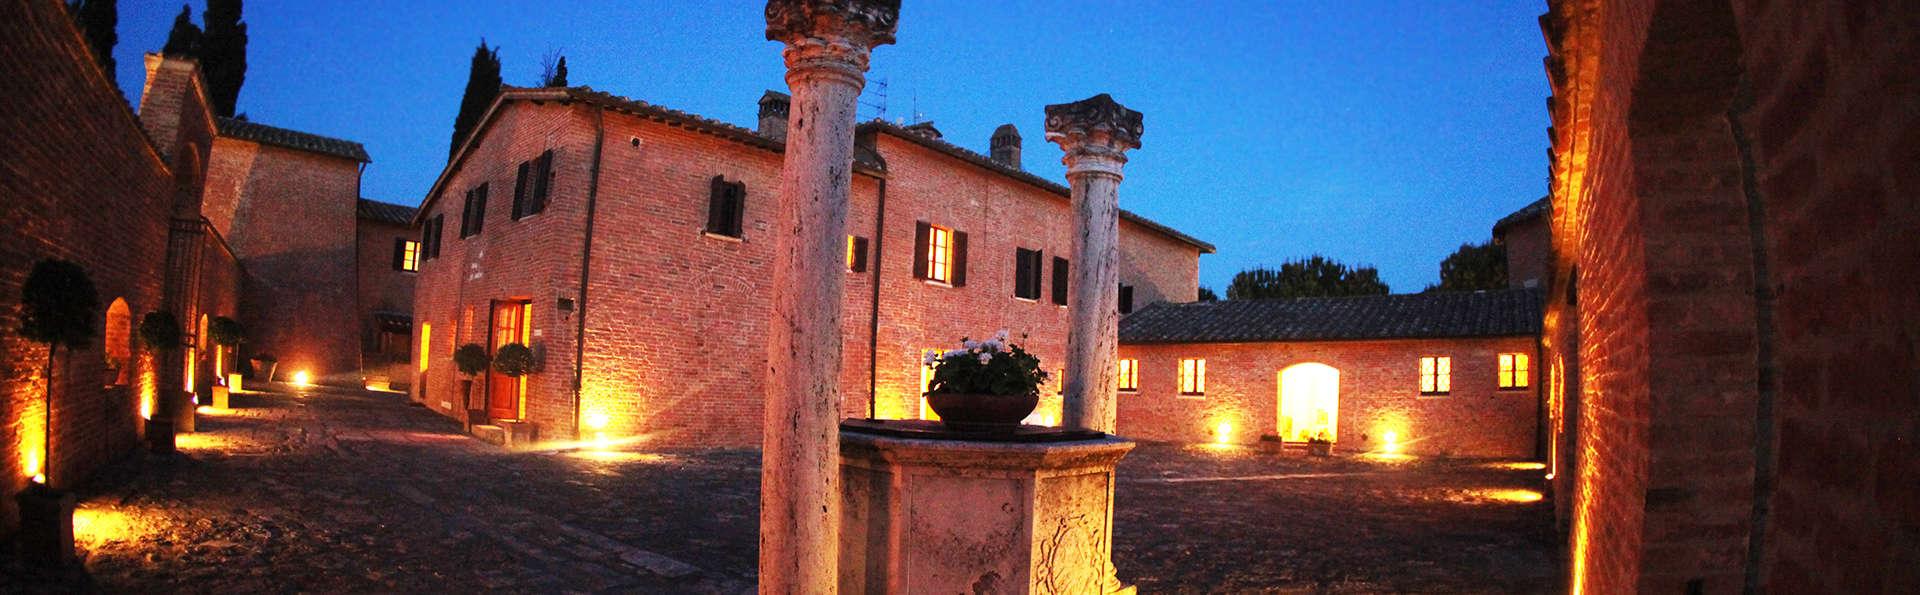 Castello di Leonina Relais - edit_front.jpg